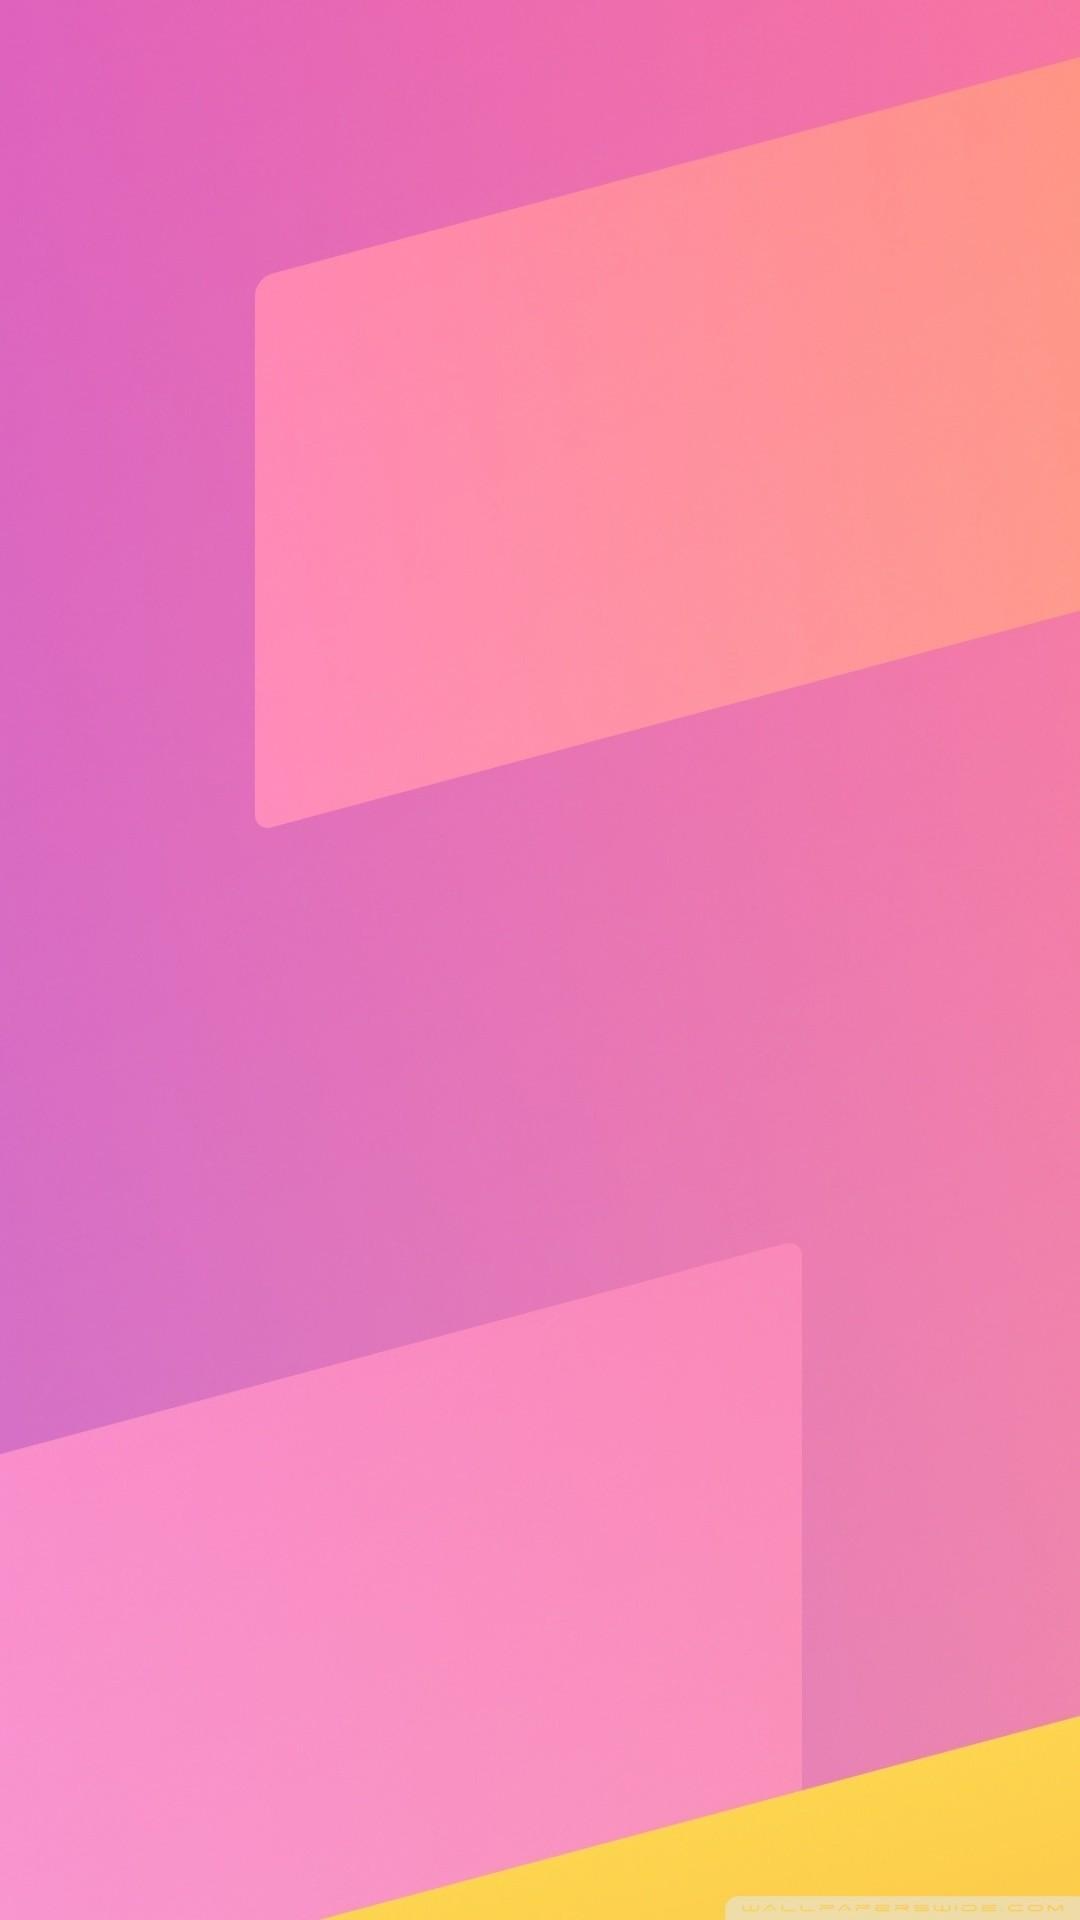 Free Opera Reborn Pink phone wallpaper by willow17